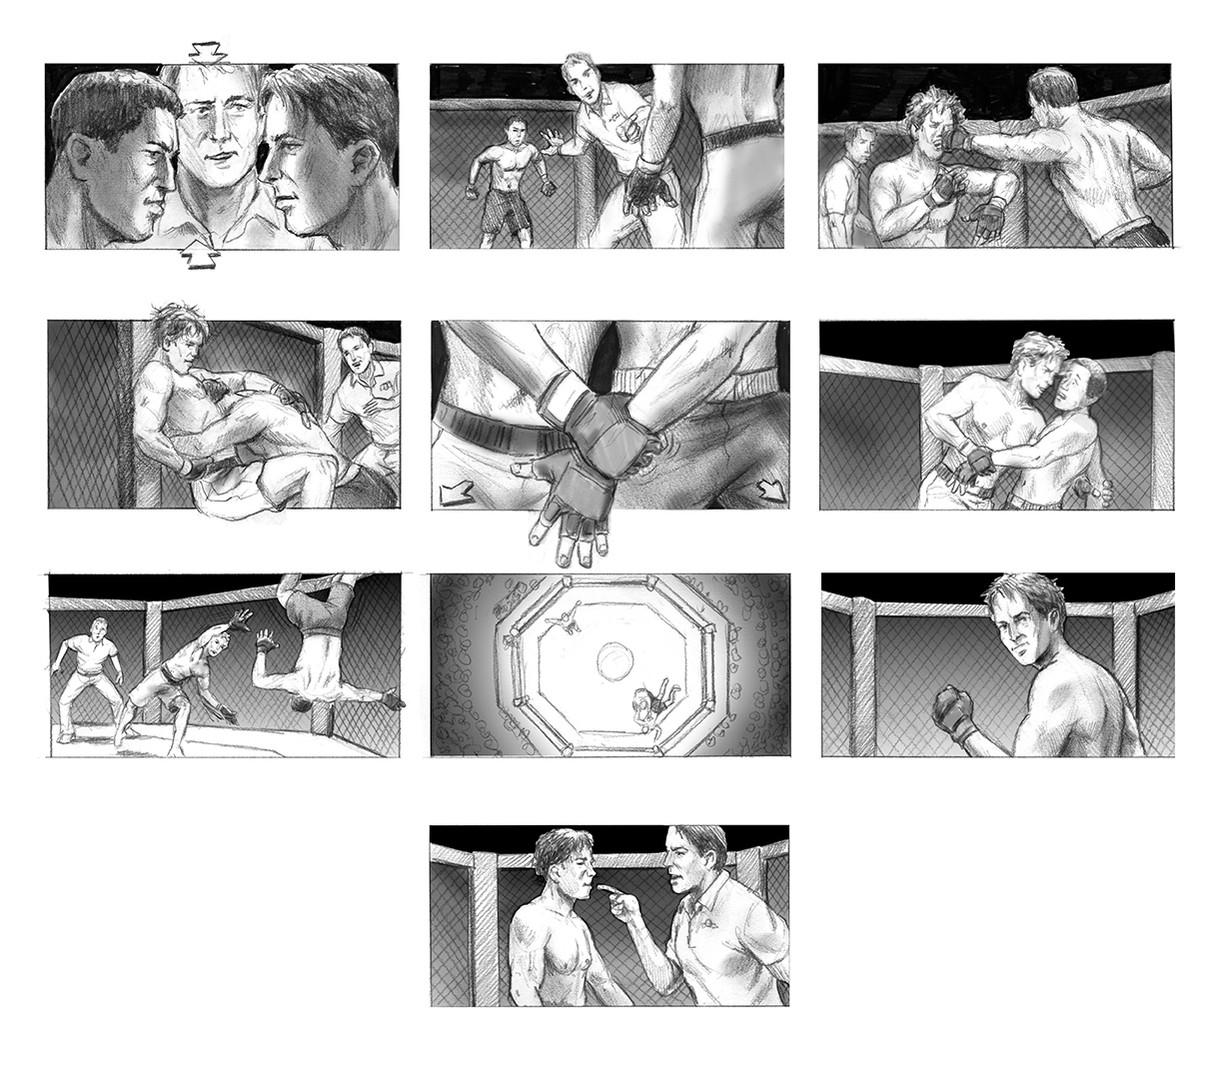 Soldier Fight scene storyboards 72dpi.jp